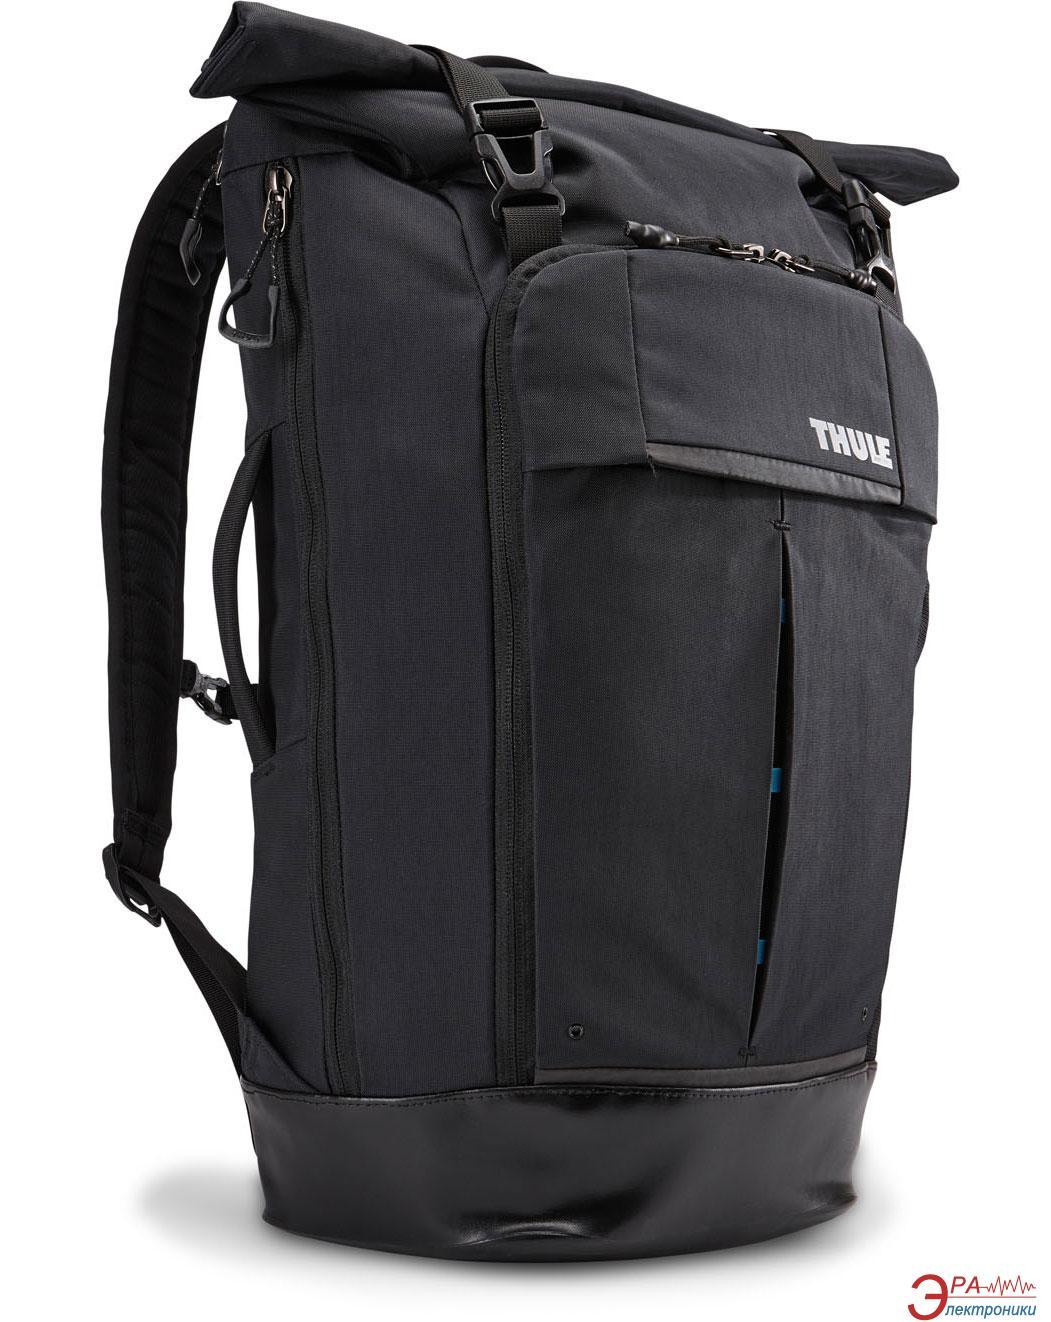 Рюкзак для ноутбука Thule Paramount 24L Rolltop Daypack (TRDP115)